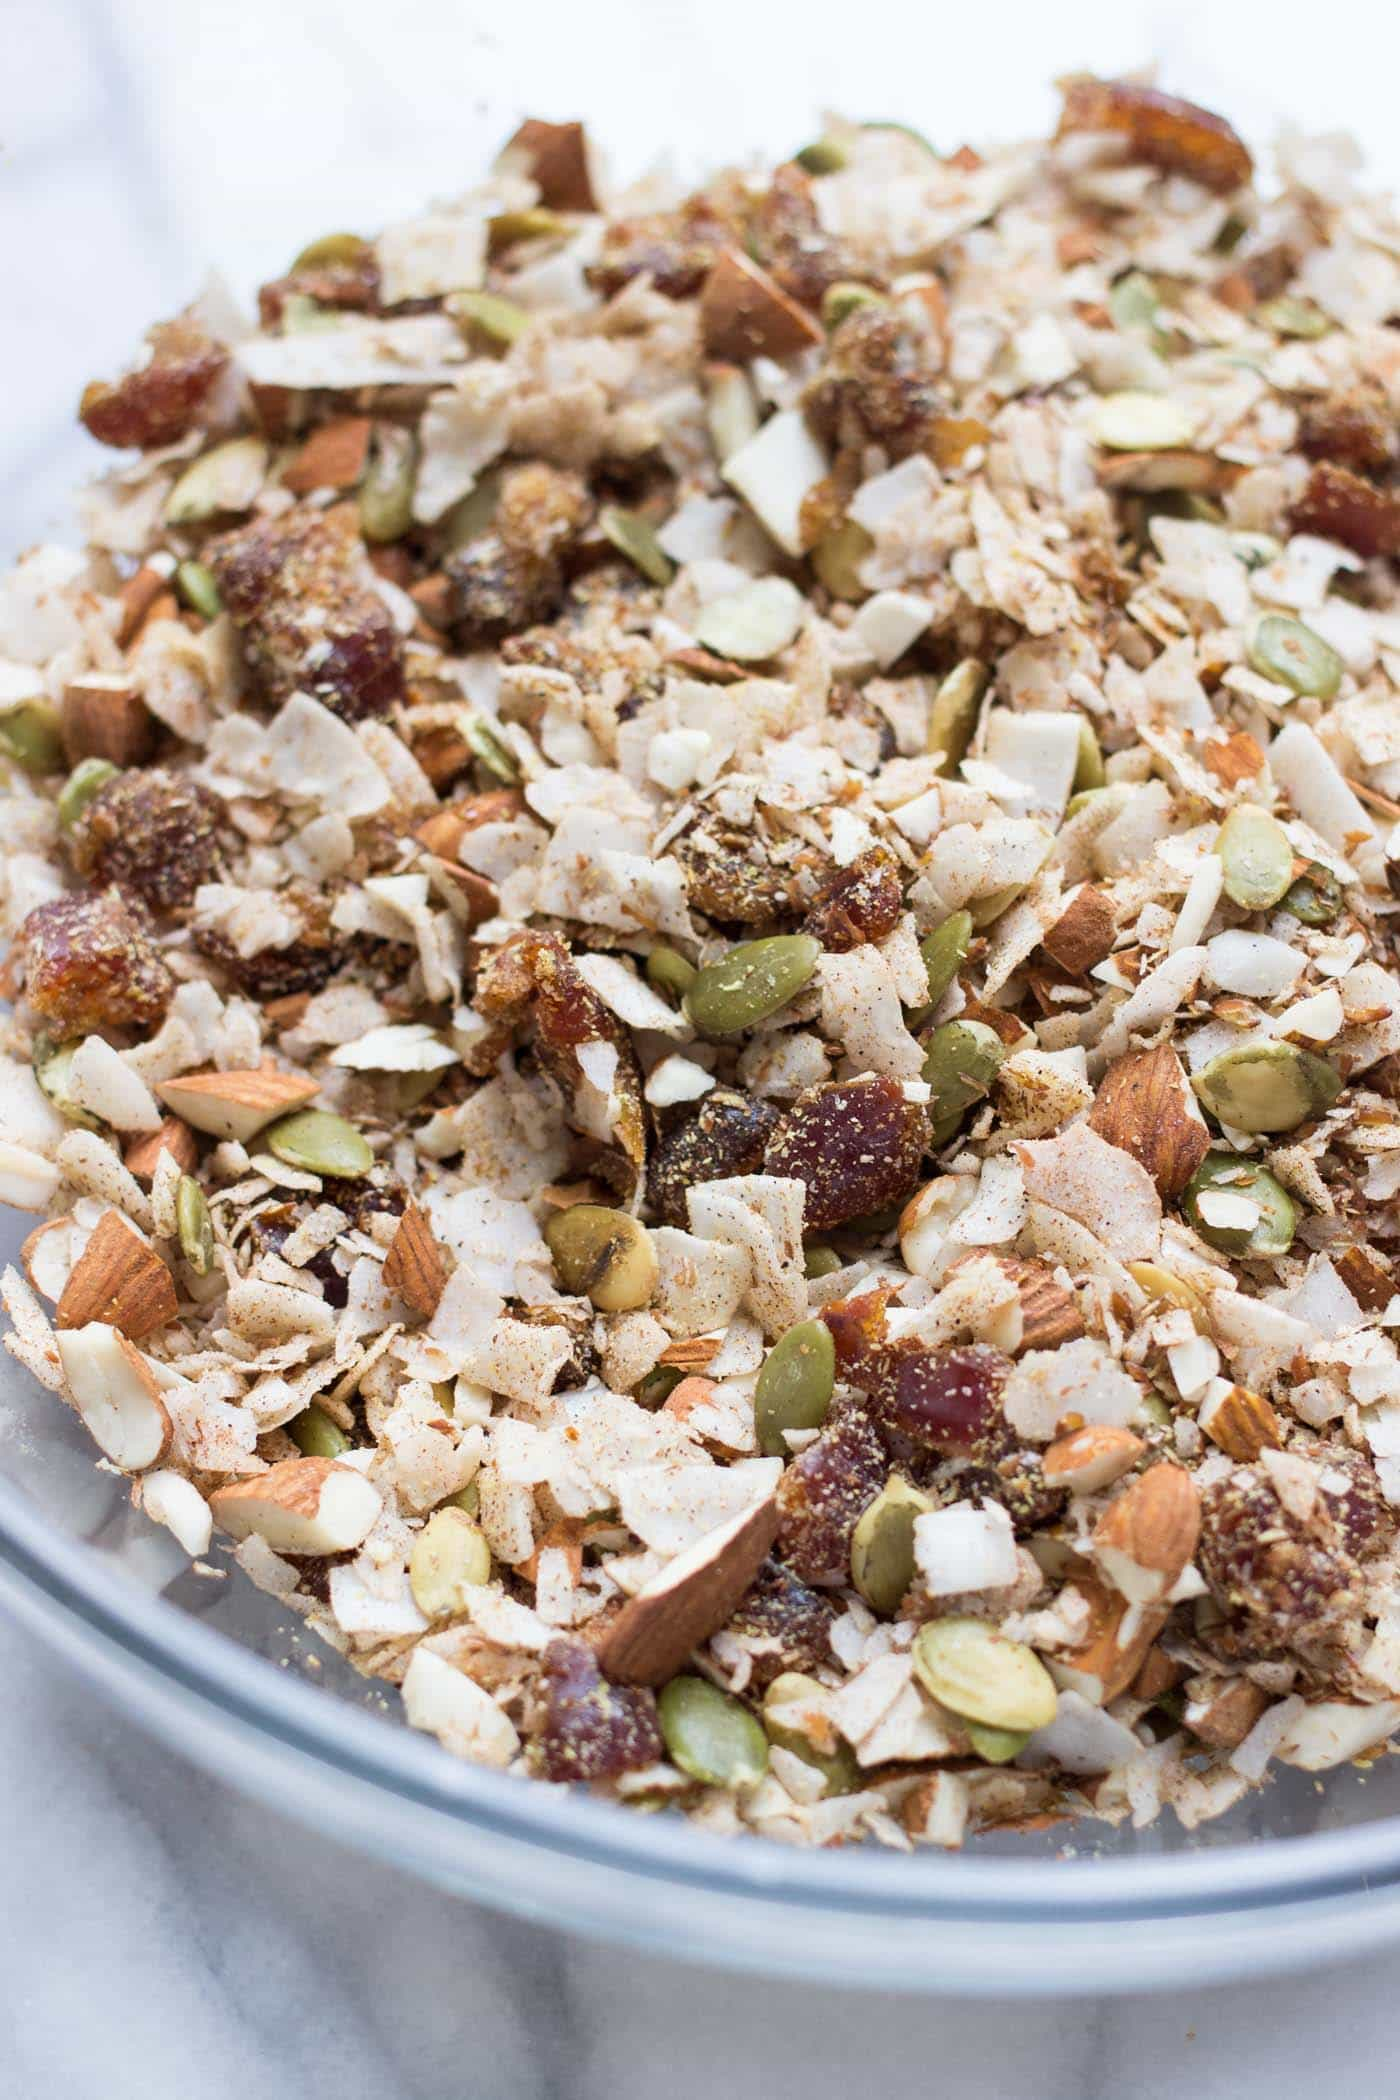 How to make perfect grain-free granola!